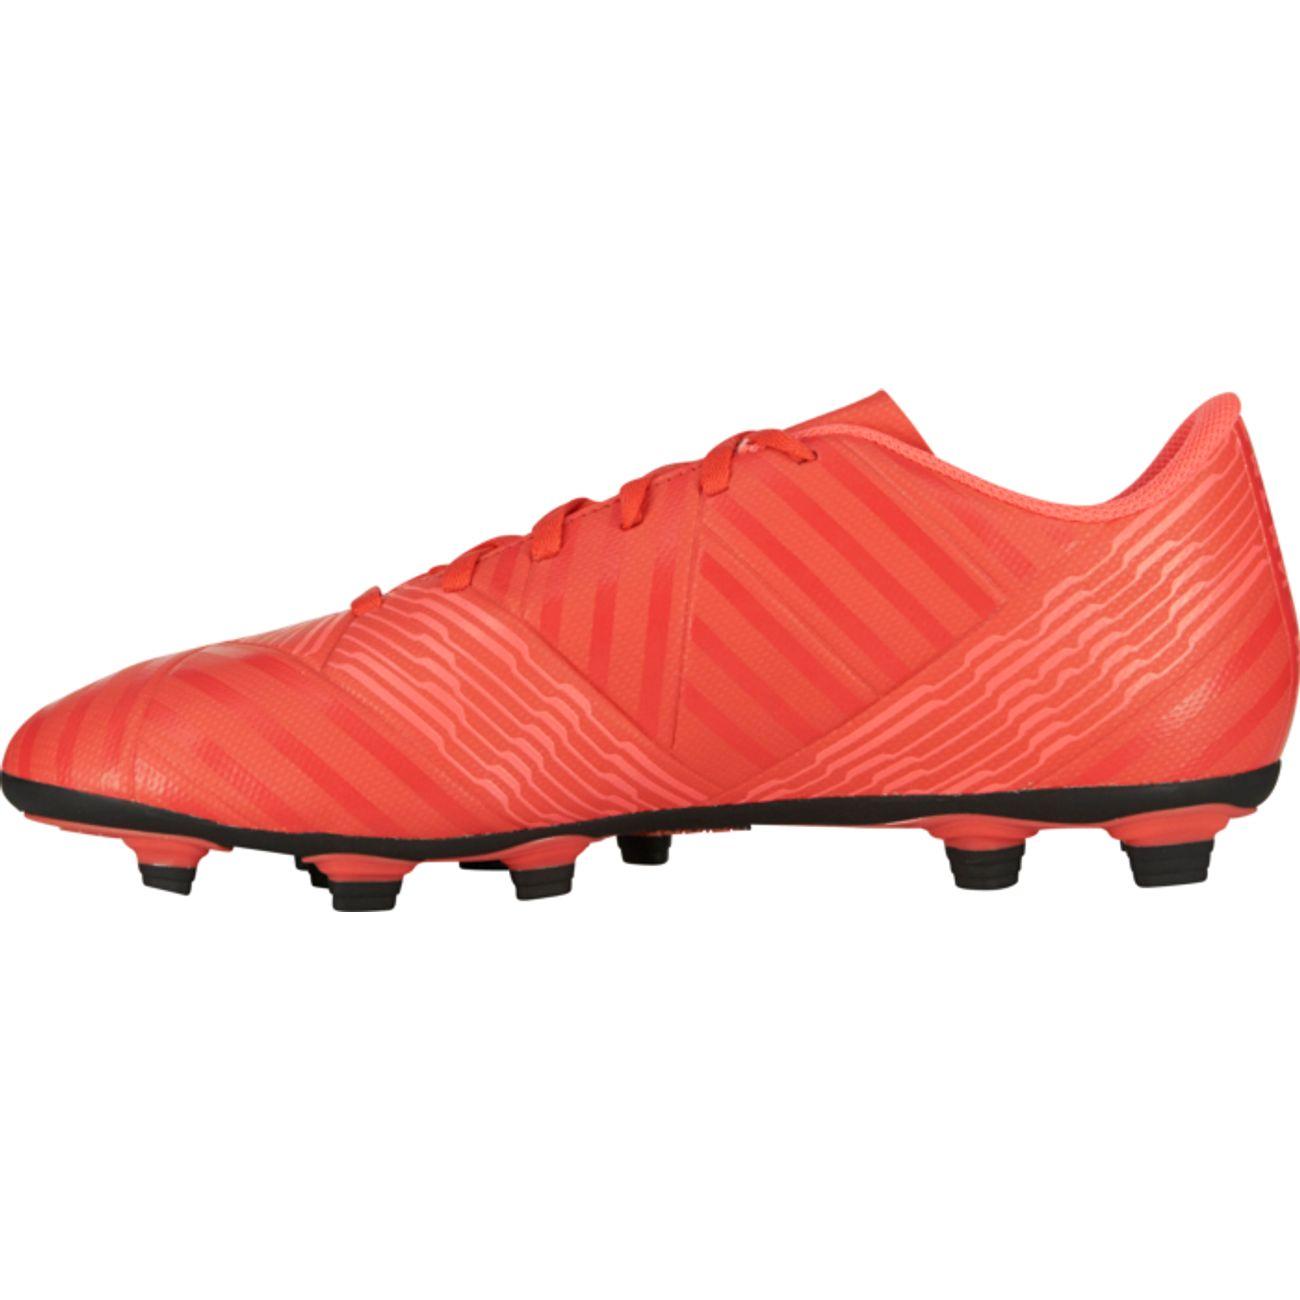 4 Football Nemeziz Adidas Chaussure 17 Fxg FKJTcl1